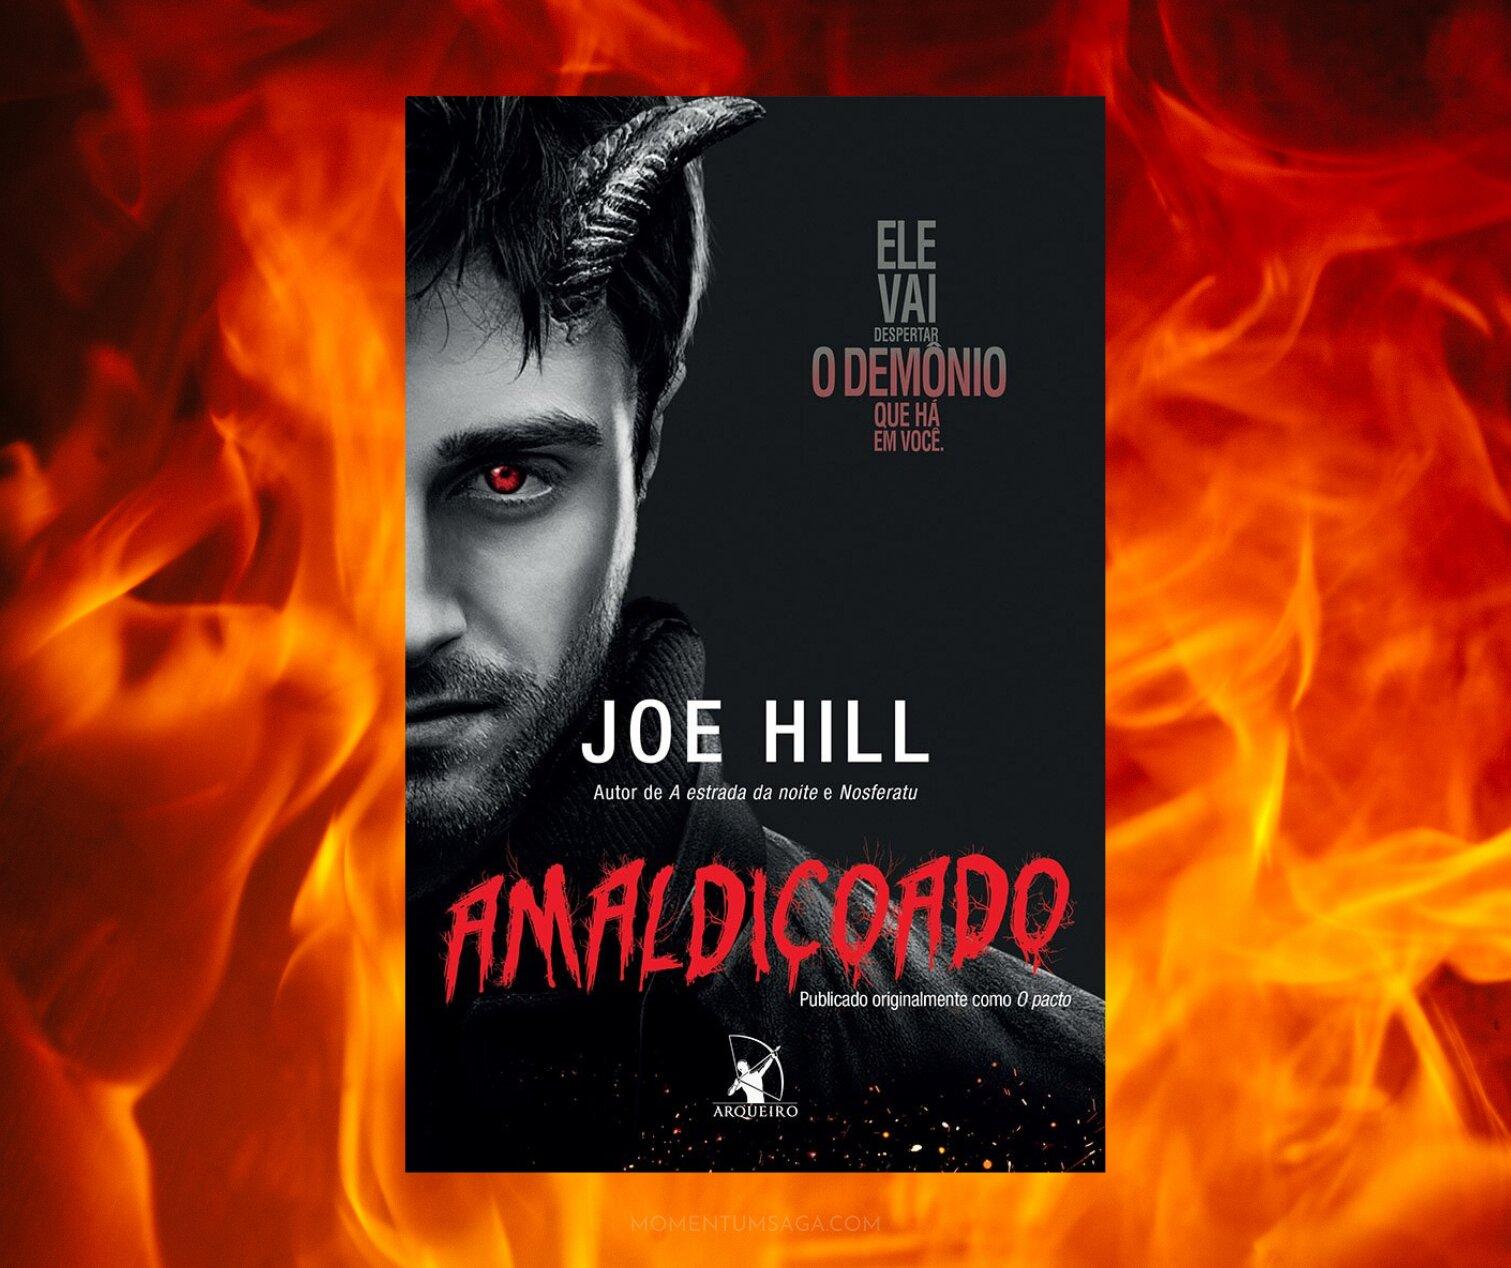 Resenha: Amaldiçoado, de Joe Hill